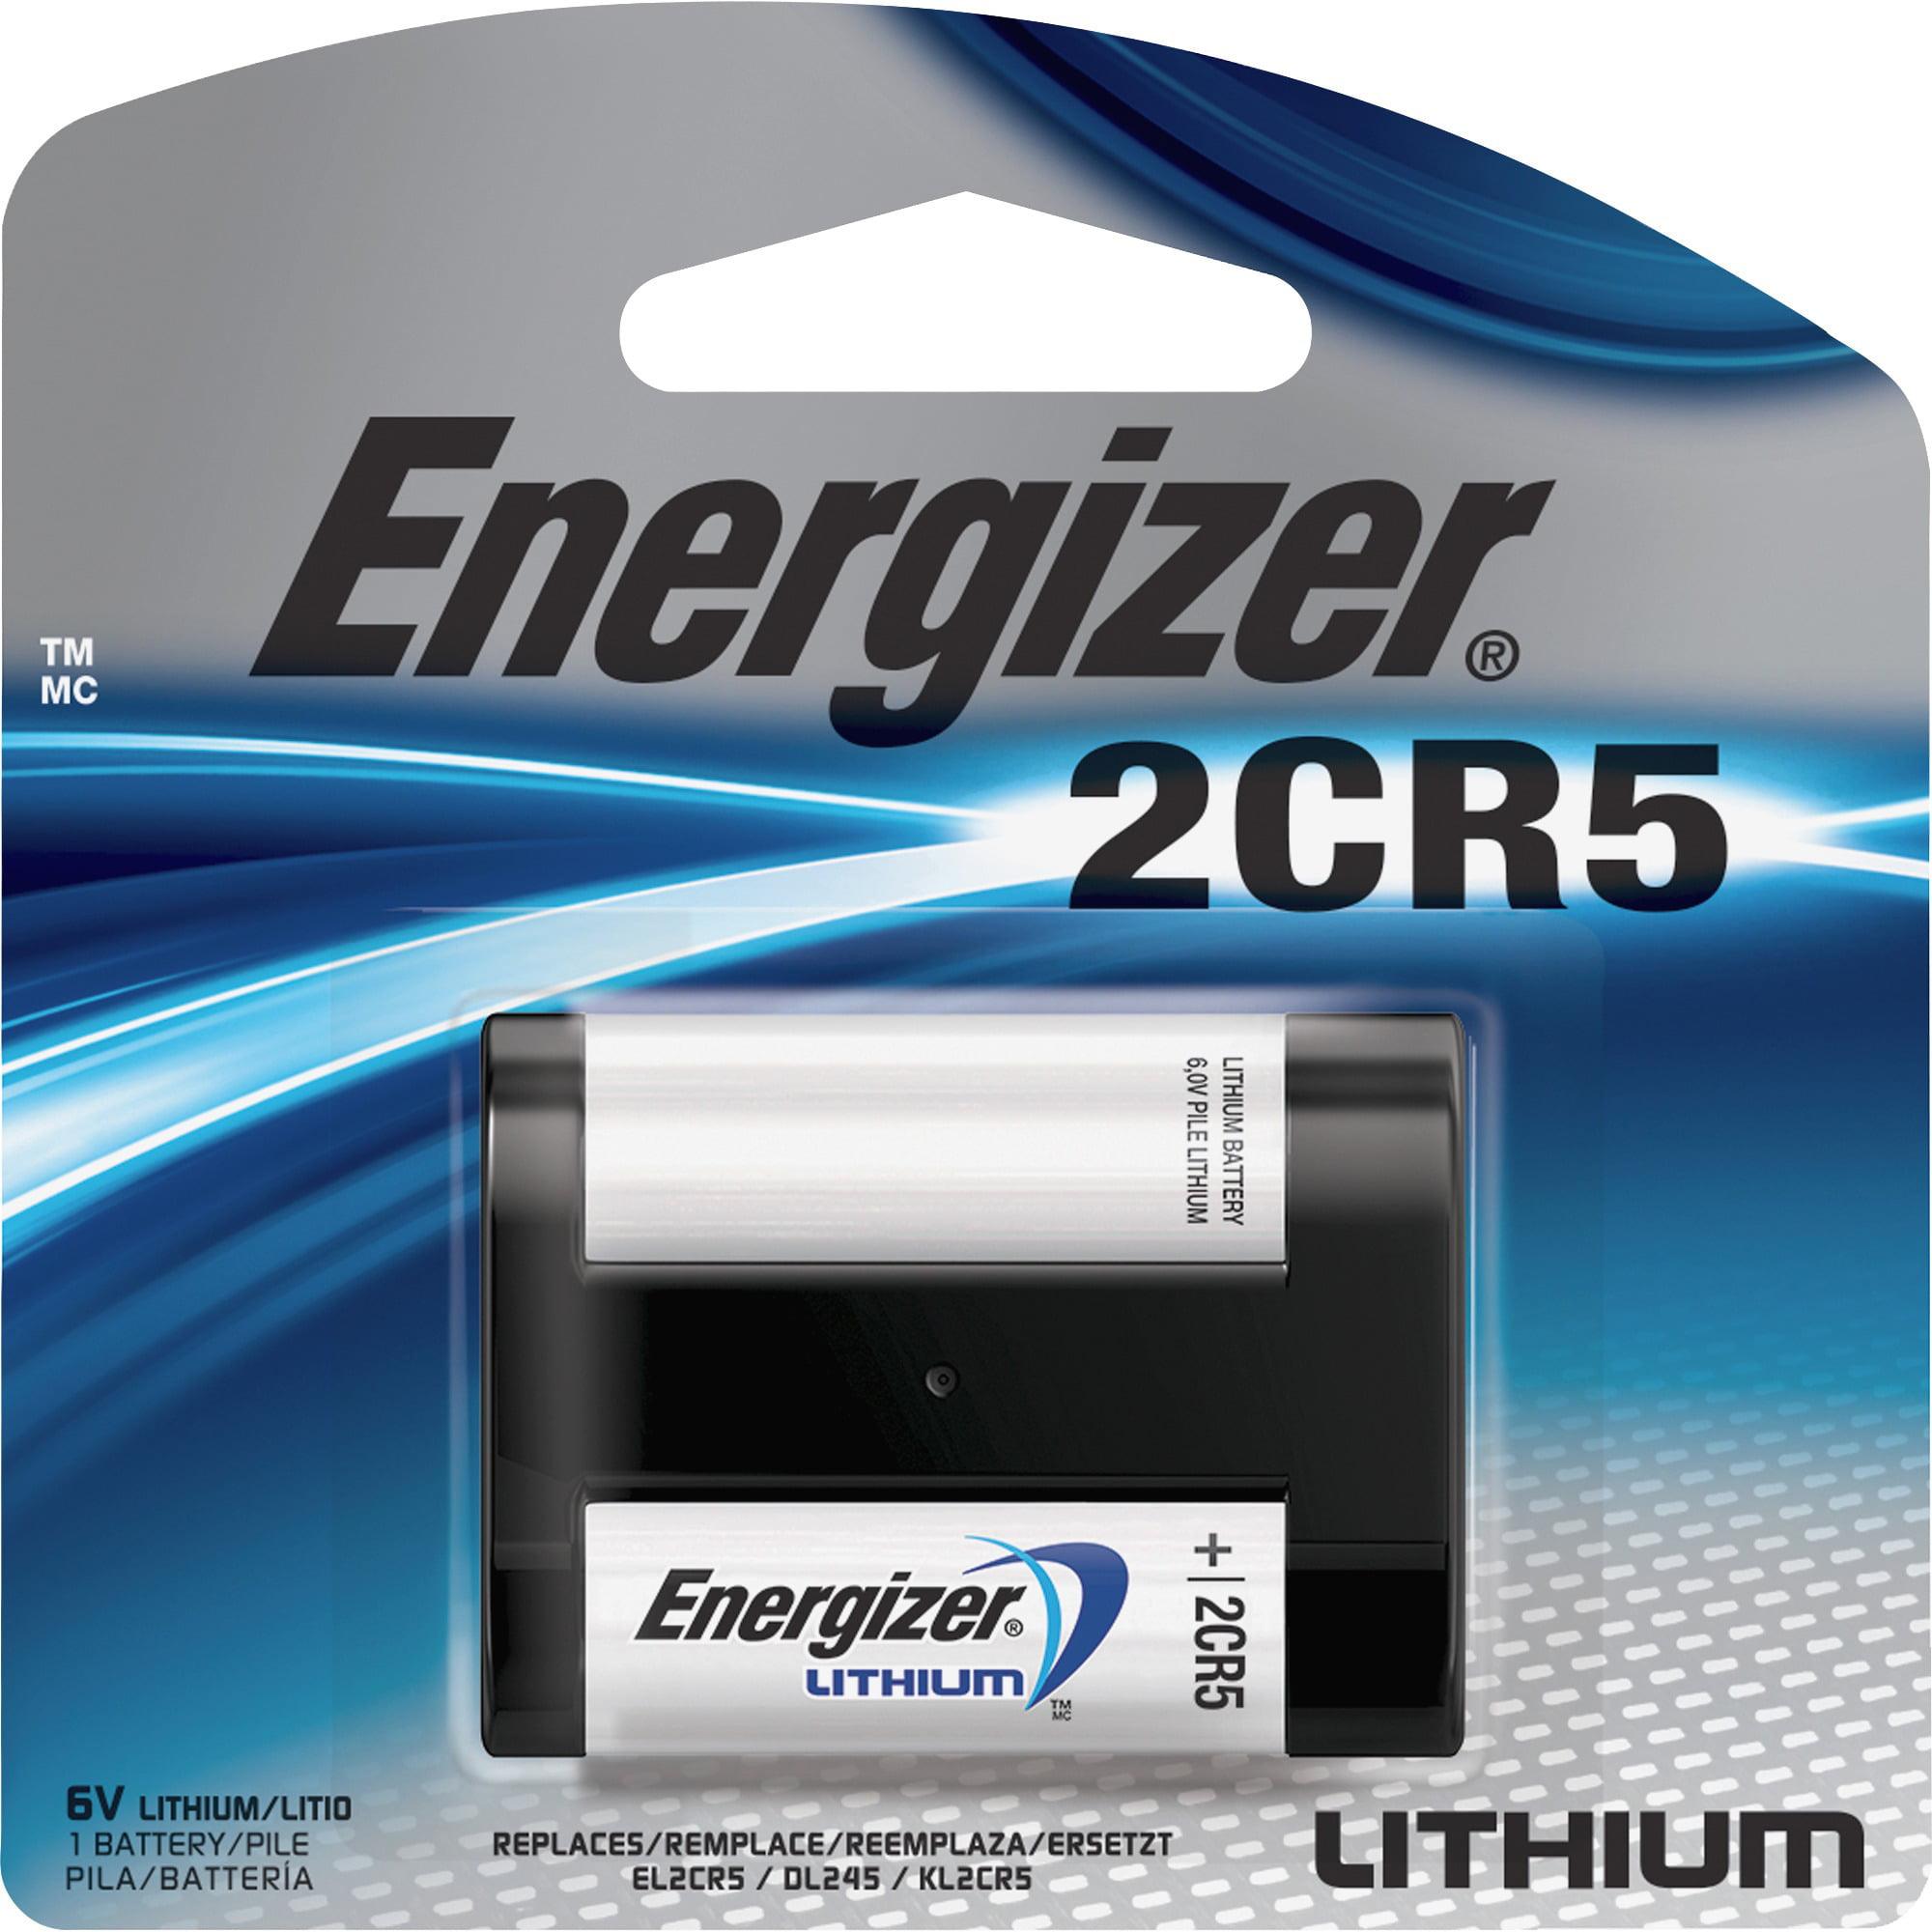 Energizer, EVEEL2CR5BPCT, 2CR5 e2 Lithium Photo 6-Volt Battery, 24   Carton by Energizer Holdings, Inc